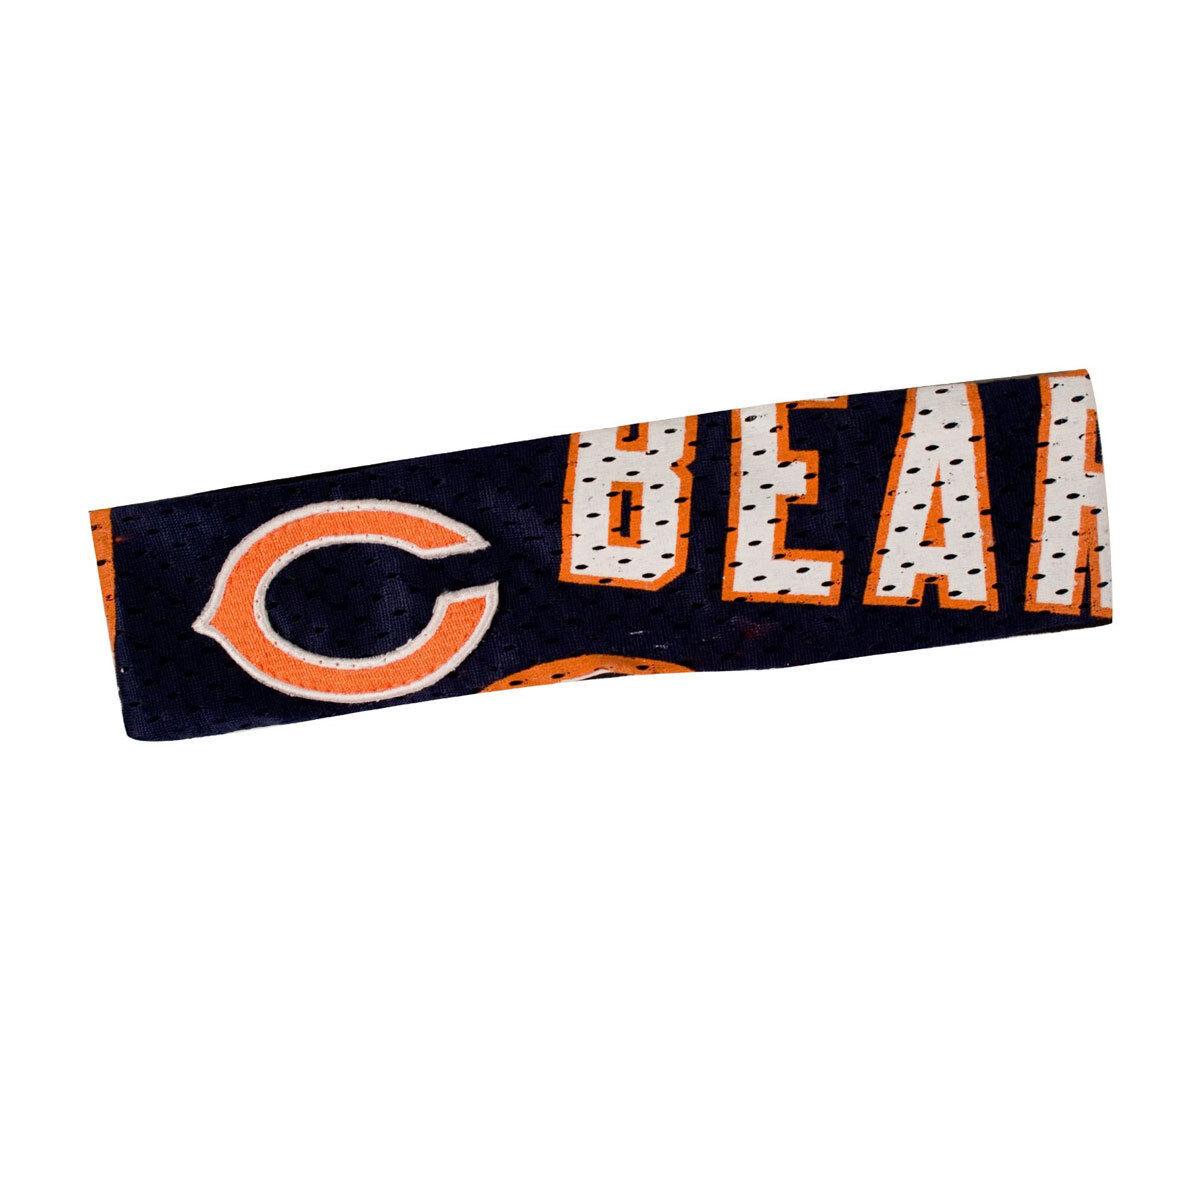 New NFL All Team Pick Your Team Fanband Jersey Headband Head-Band Fan Gear